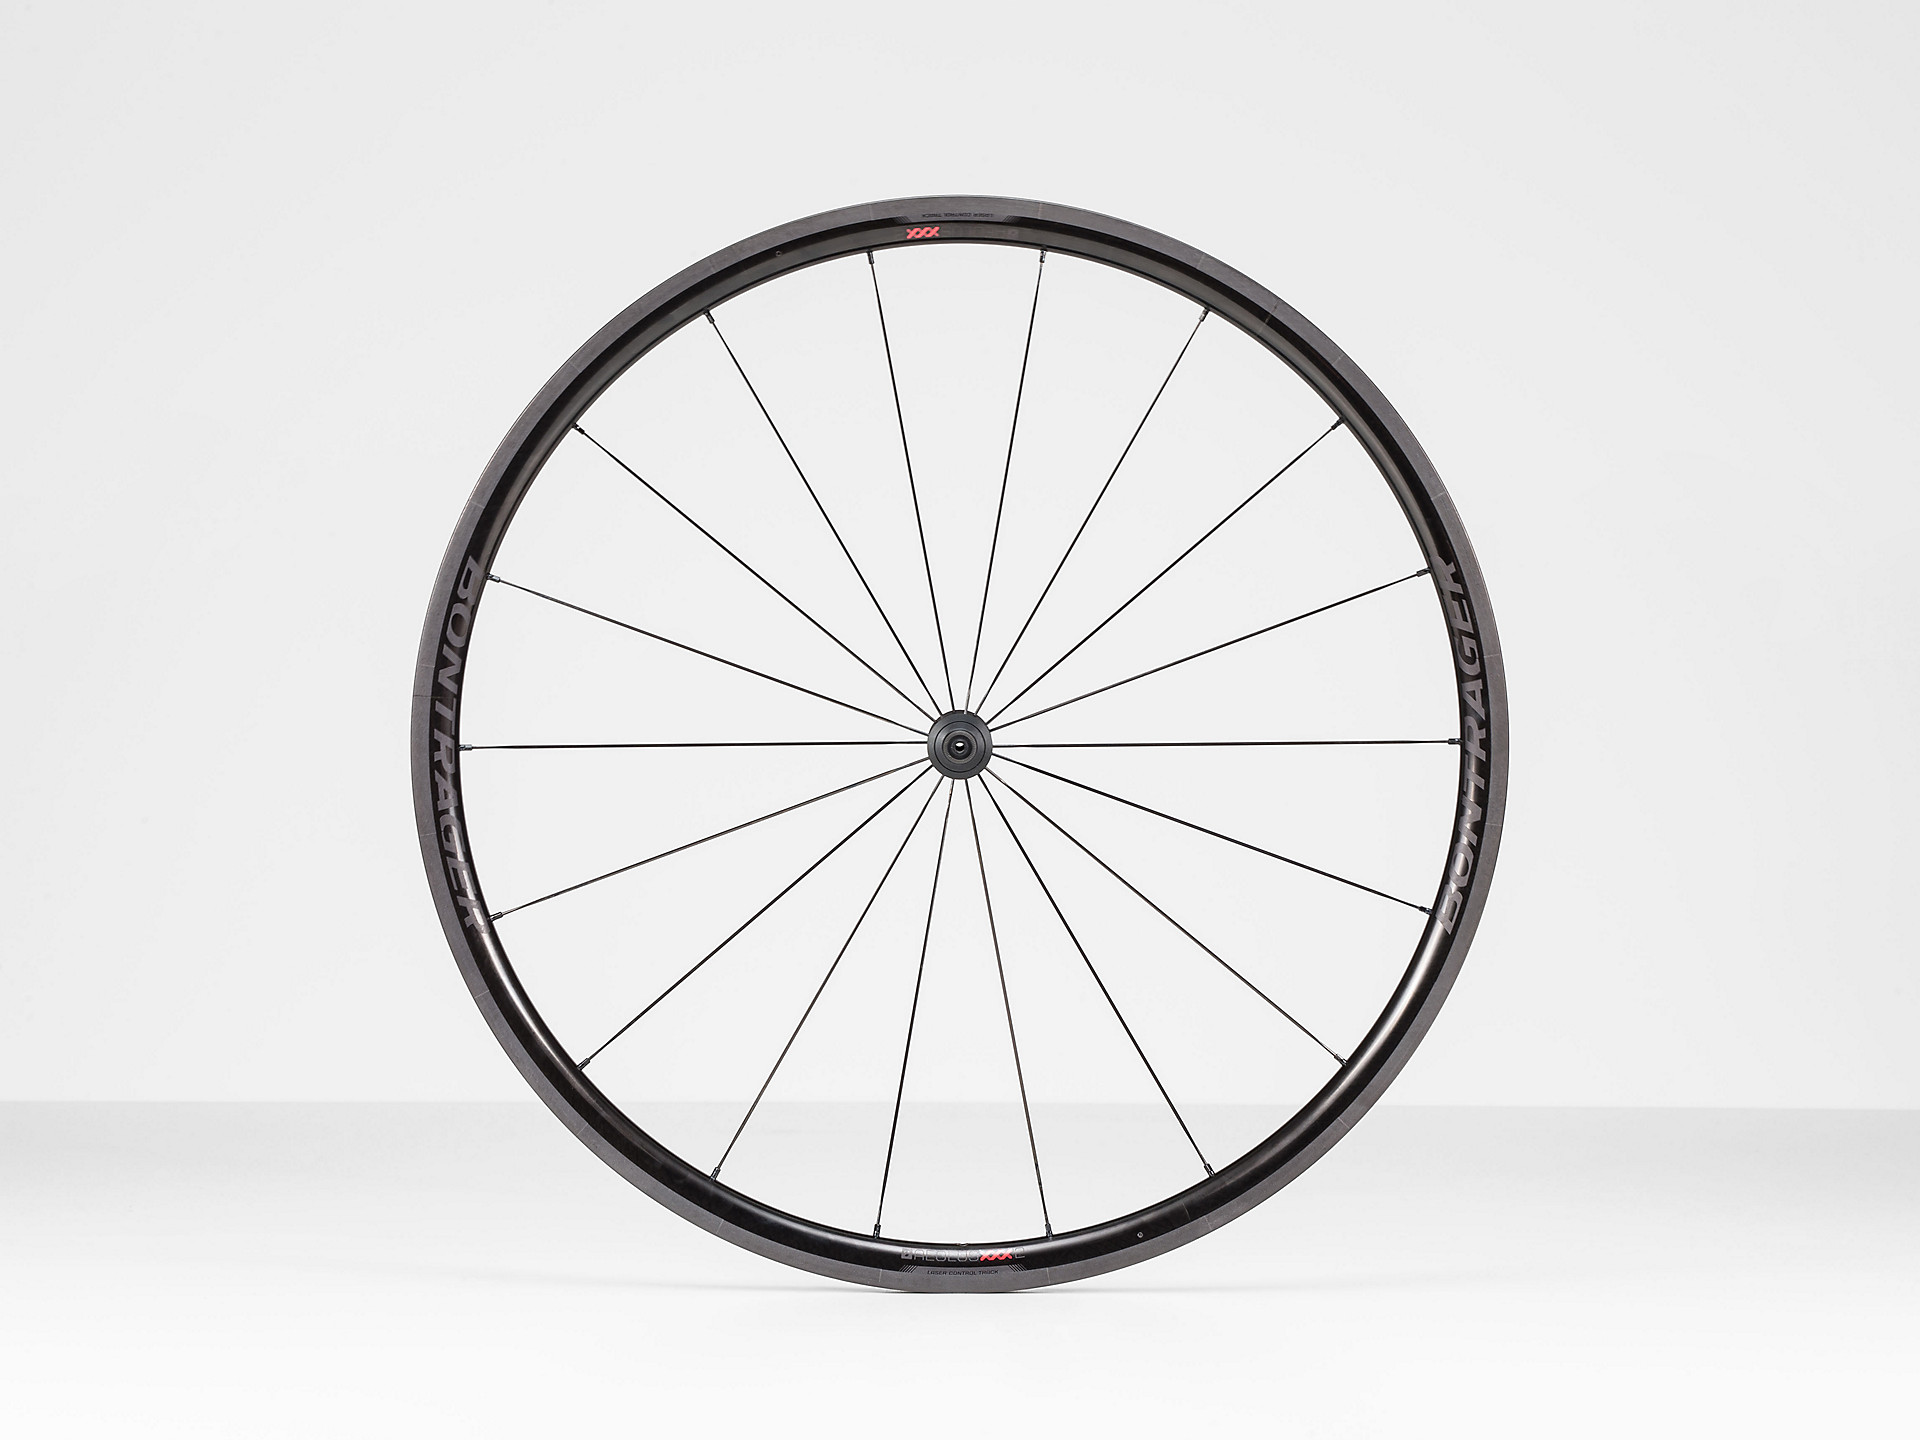 LIGHT-WEIGHT Carbon Bicycle Wheels Stickers Decals Rim Sticker Kit 2Wheels 700C